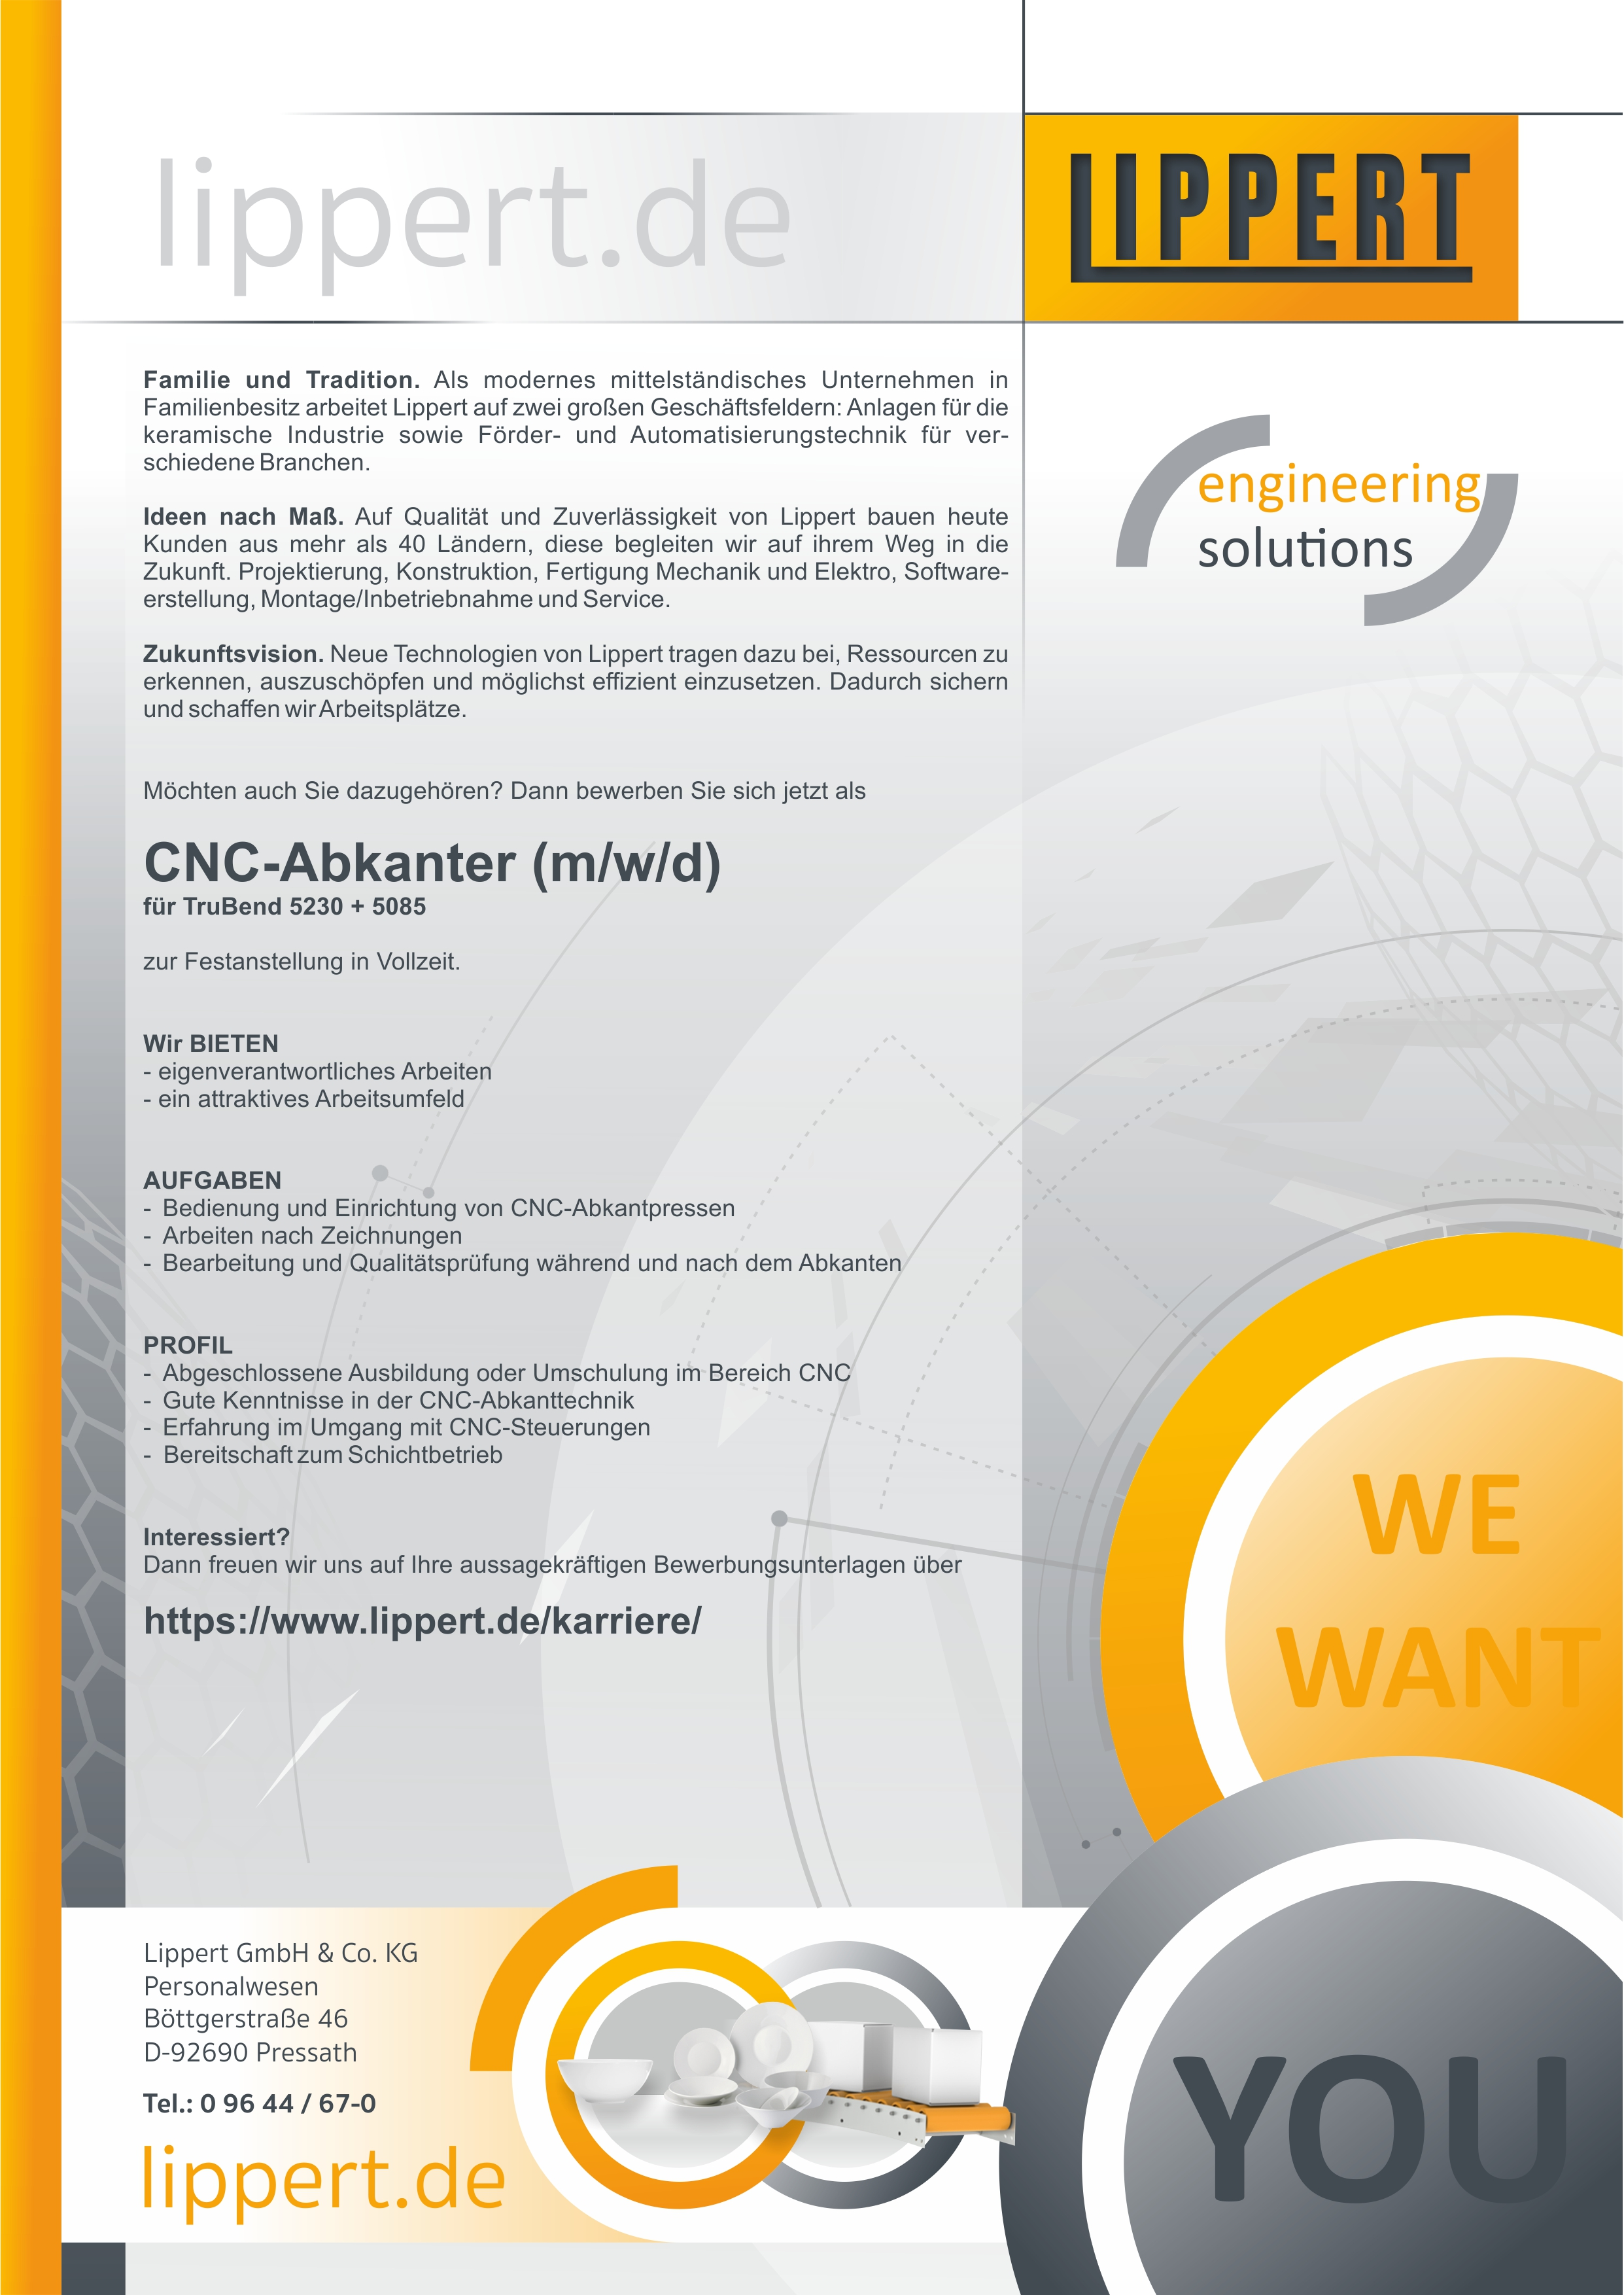 CNC-Abkanter (m/w/d)